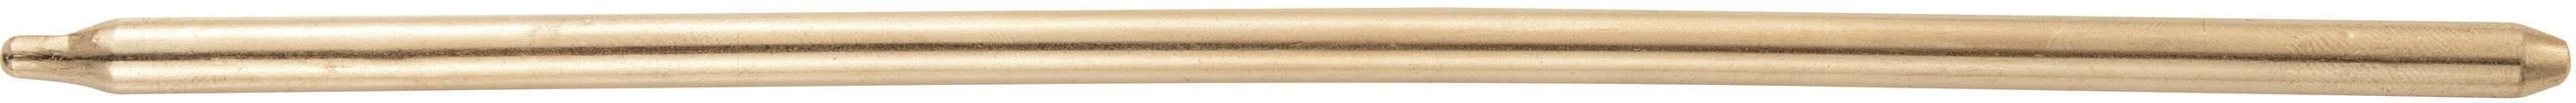 Teplovodná rúrka Gelid CP-S6200-01, (Ø x d) 6 mm x 200 mm, meď, voda